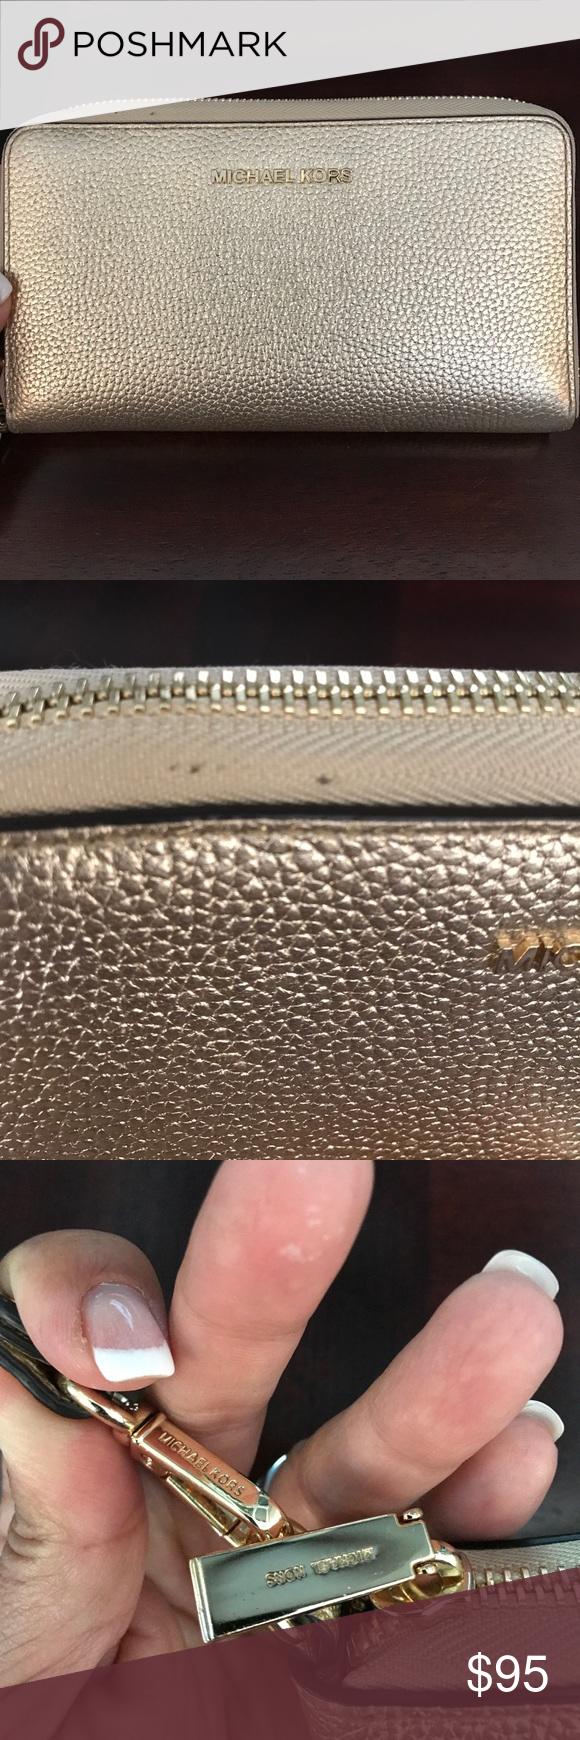 93e612fd26294 Michael Kors Gold Wallet   Phone Wristlet MICHAEL Michael Kors Mercer Large  Metallic Leather Smartphone Wristlet